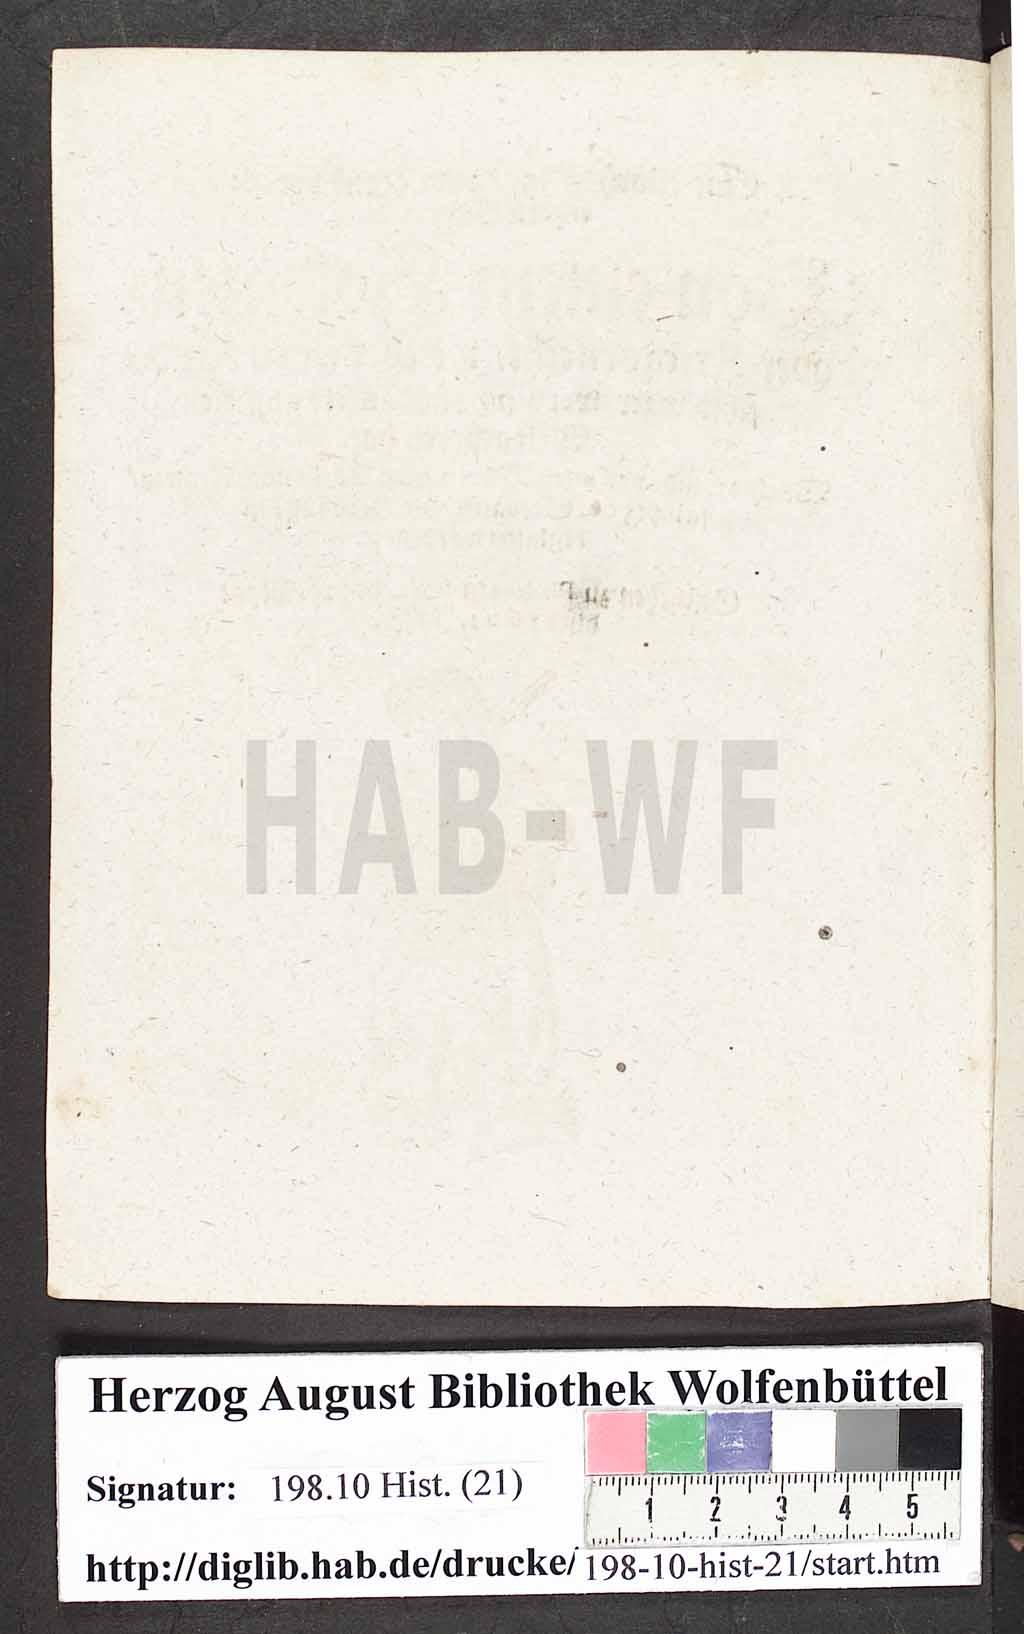 http://diglib.hab.de/drucke/198-10-hist-21/00002.jpg